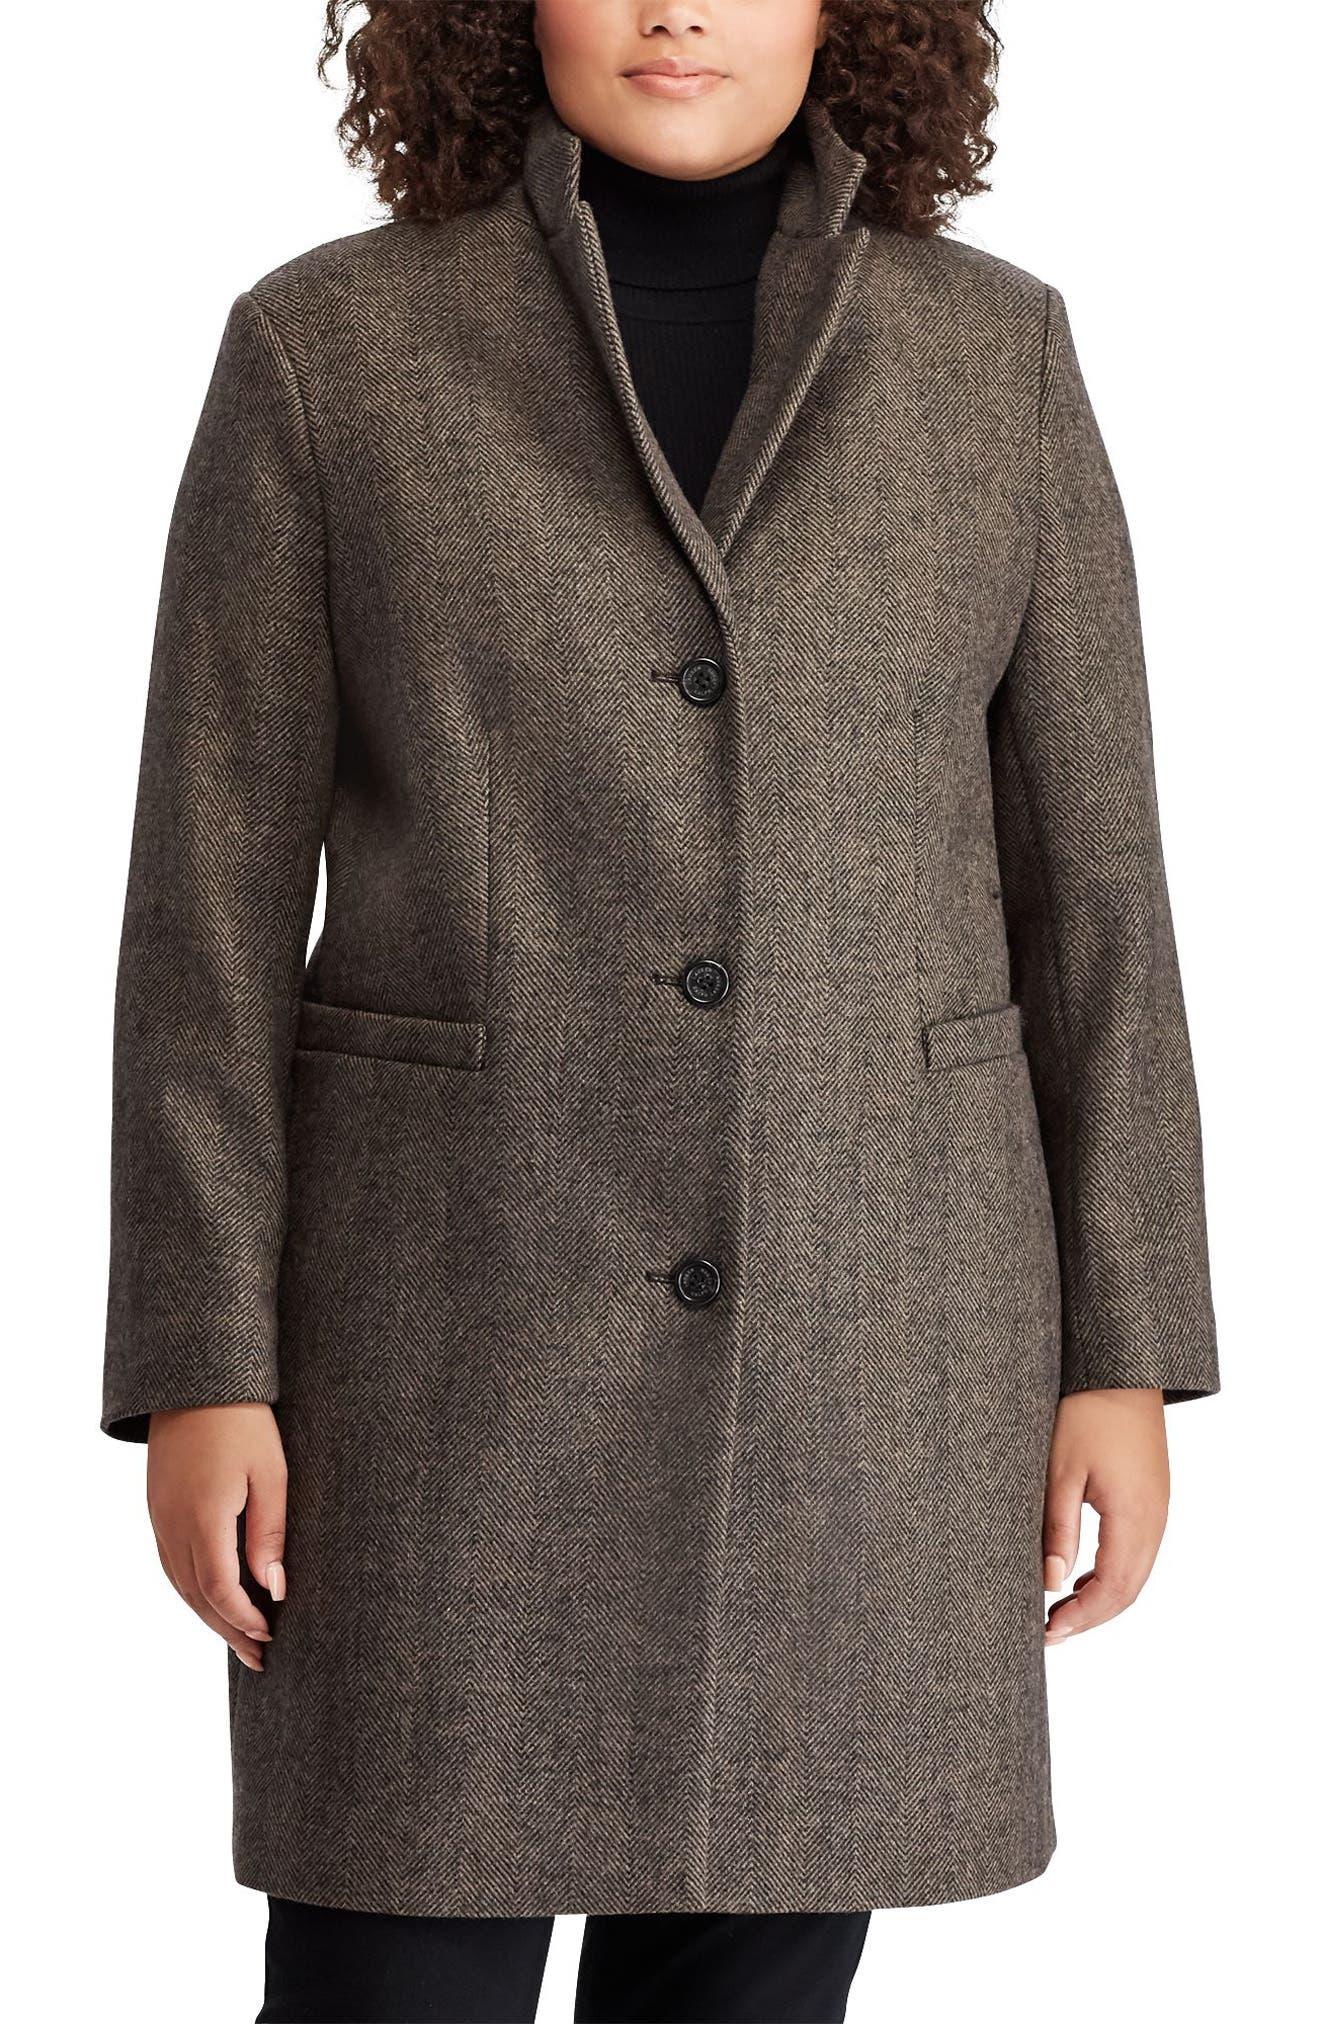 LAUREN RALPH LAUREN,                             Herringbone Wool Blend Reefer Coat,                             Main thumbnail 1, color,                             008